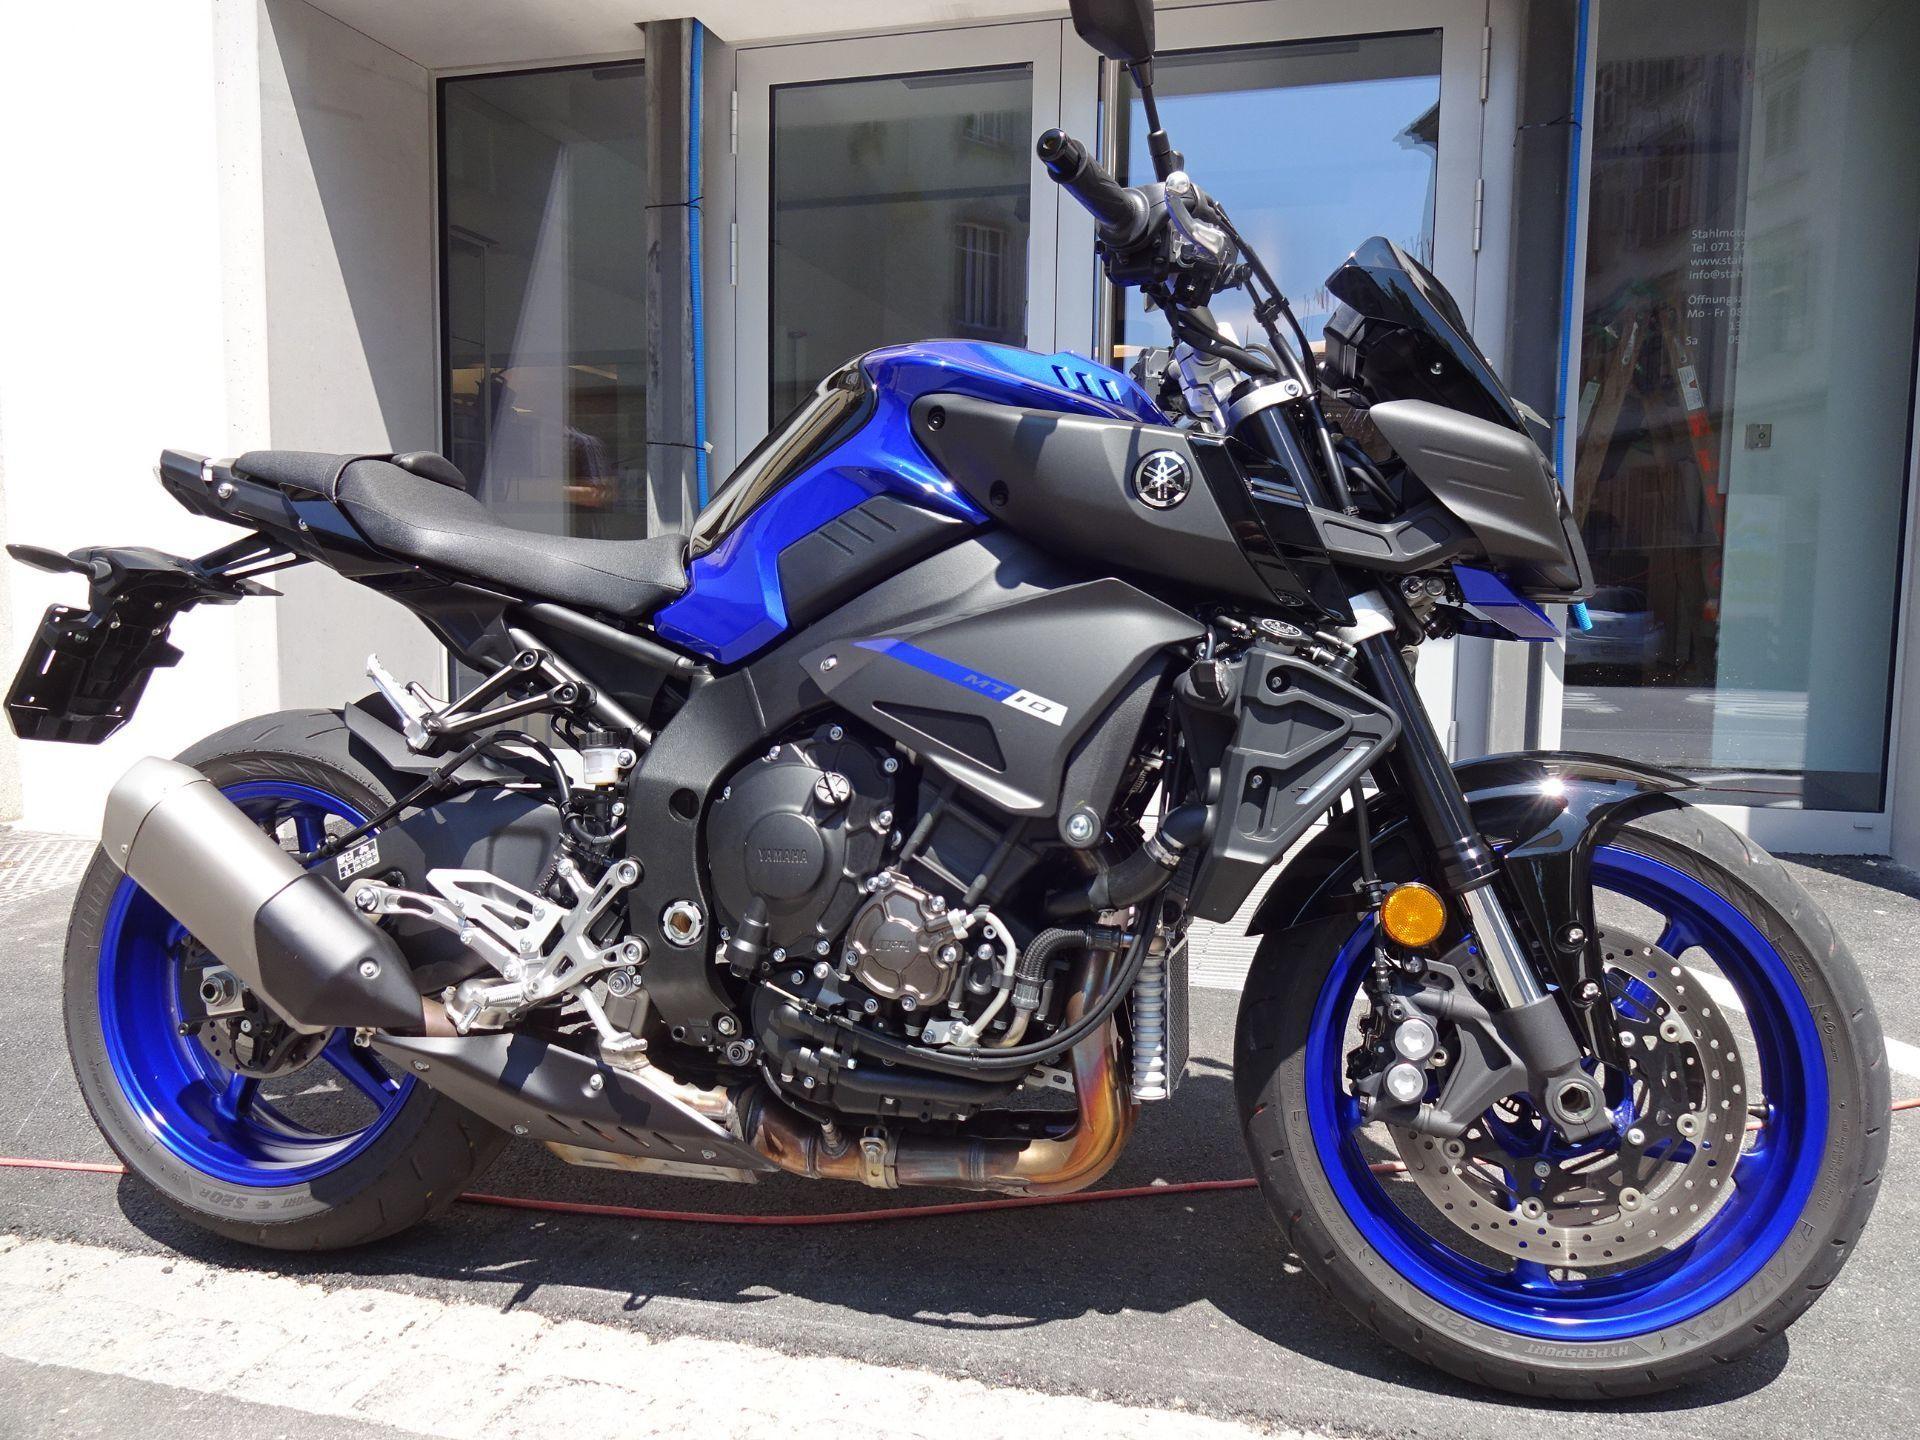 Buy motorbike Demonstration model YAMAHA MT 10 ABS Modell